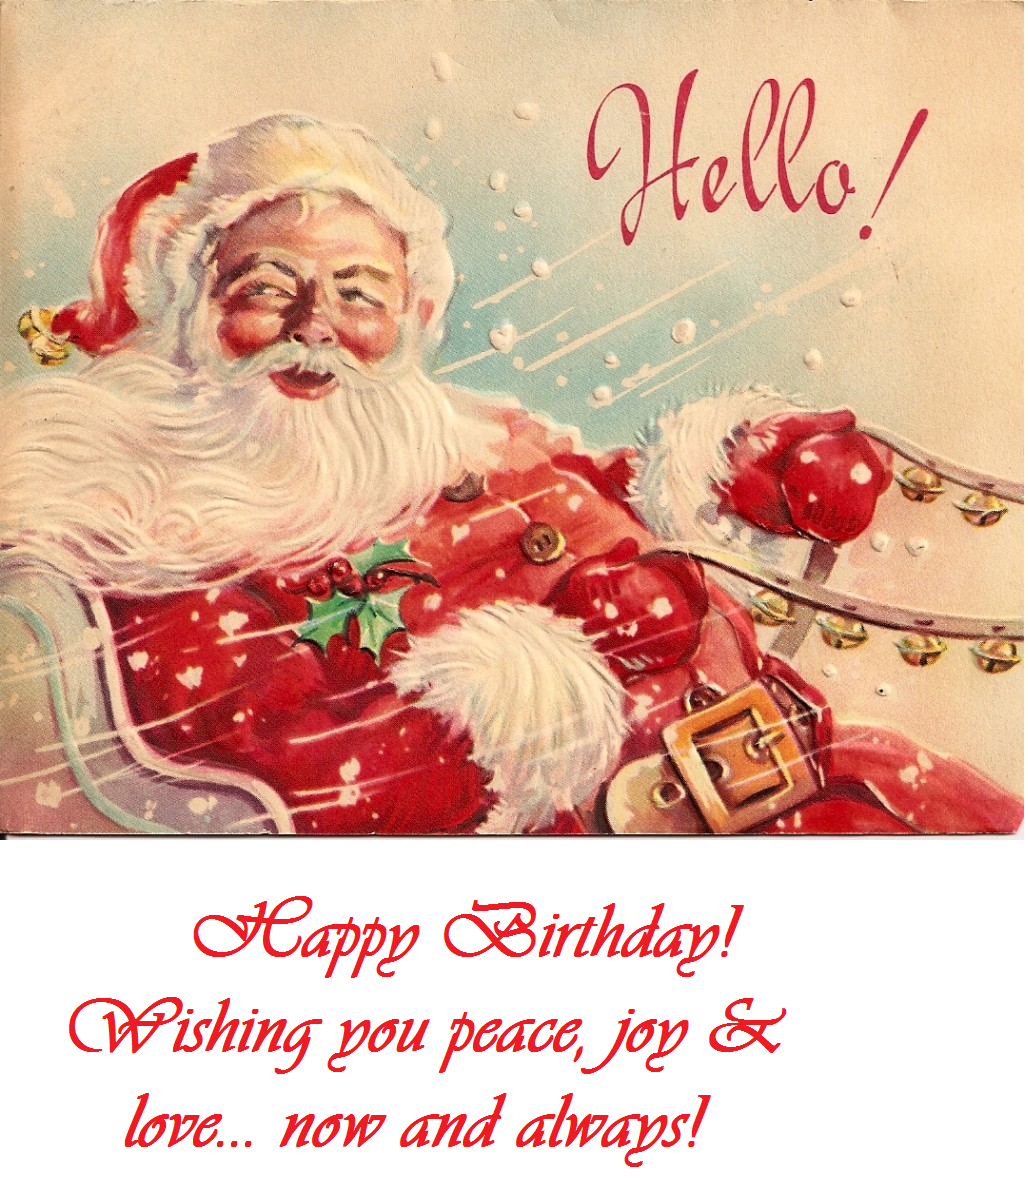 December birthday wish happy birthday wishing you peace joy december birthday wish happy birthday wishing you peace joy love bookmarktalkfo Images